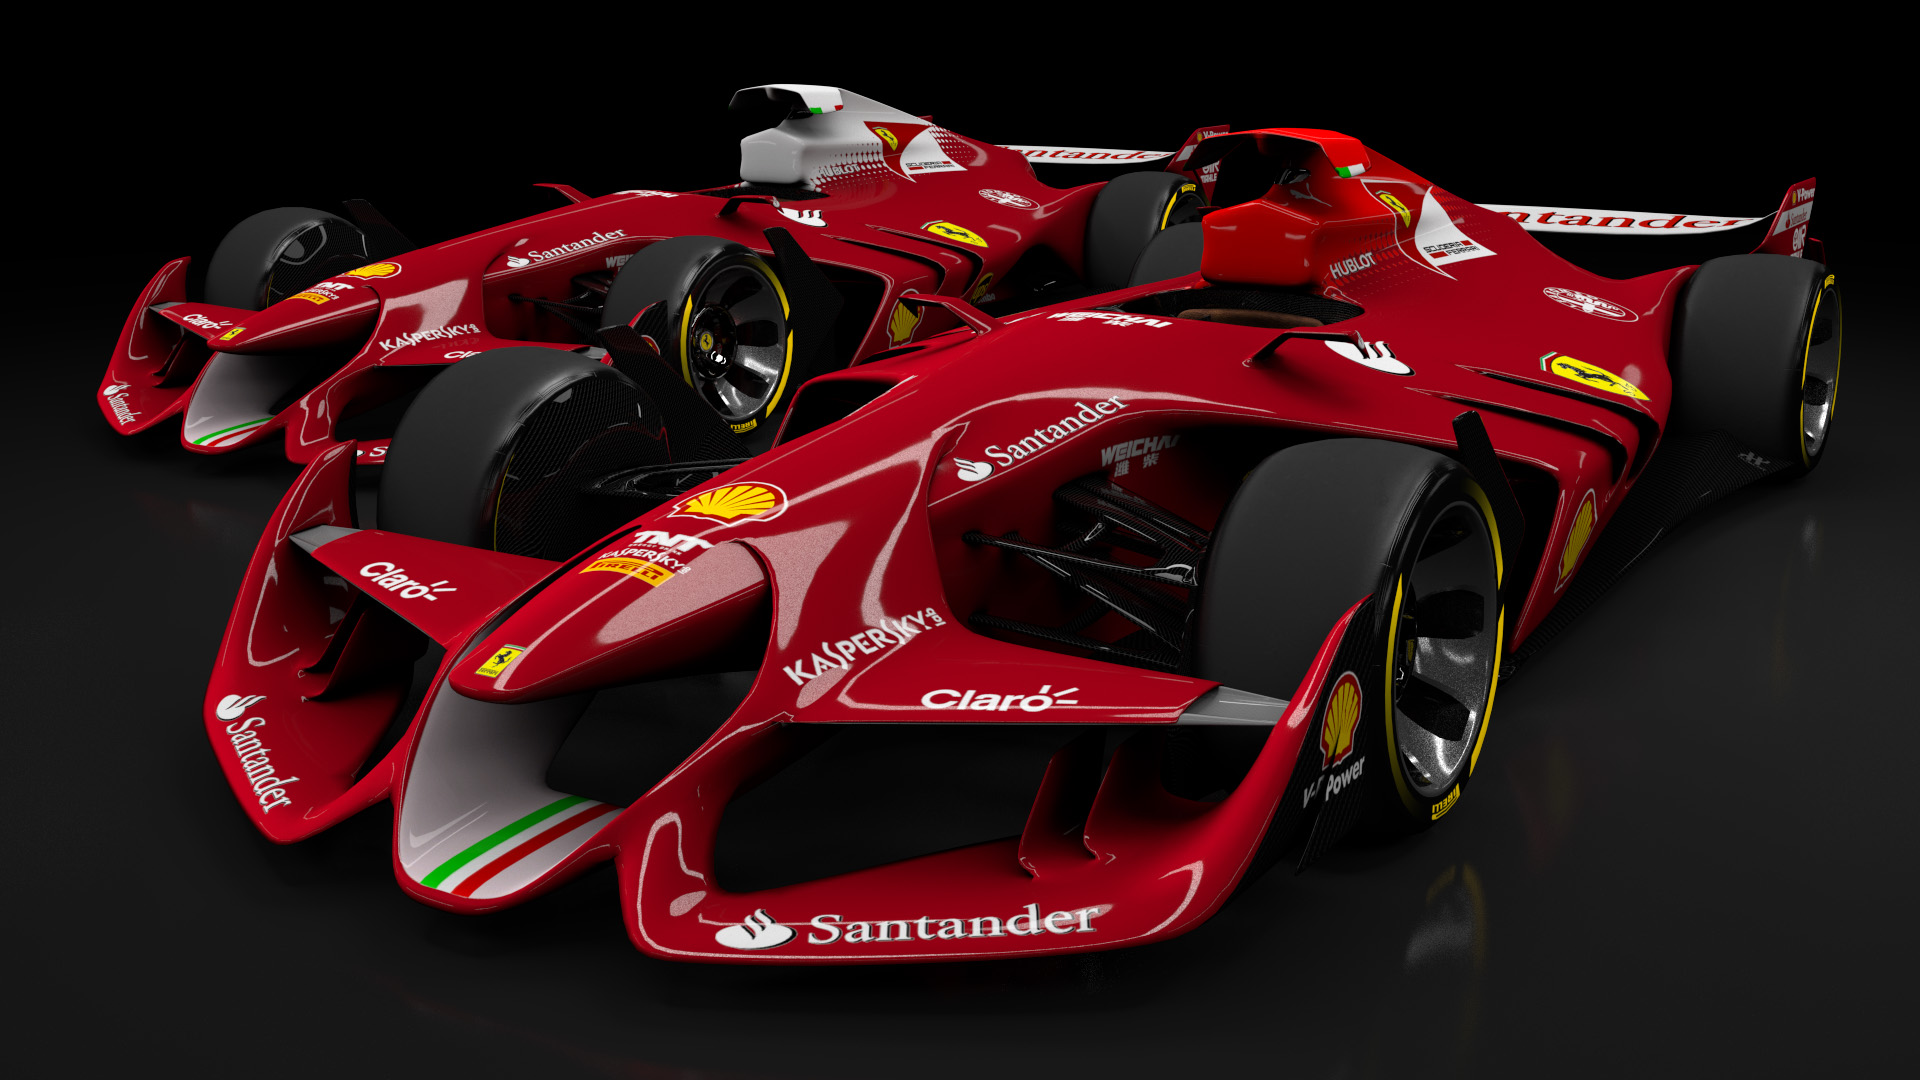 Ferraris F1 Concept Car Made For Assetto Corsa  WTF1